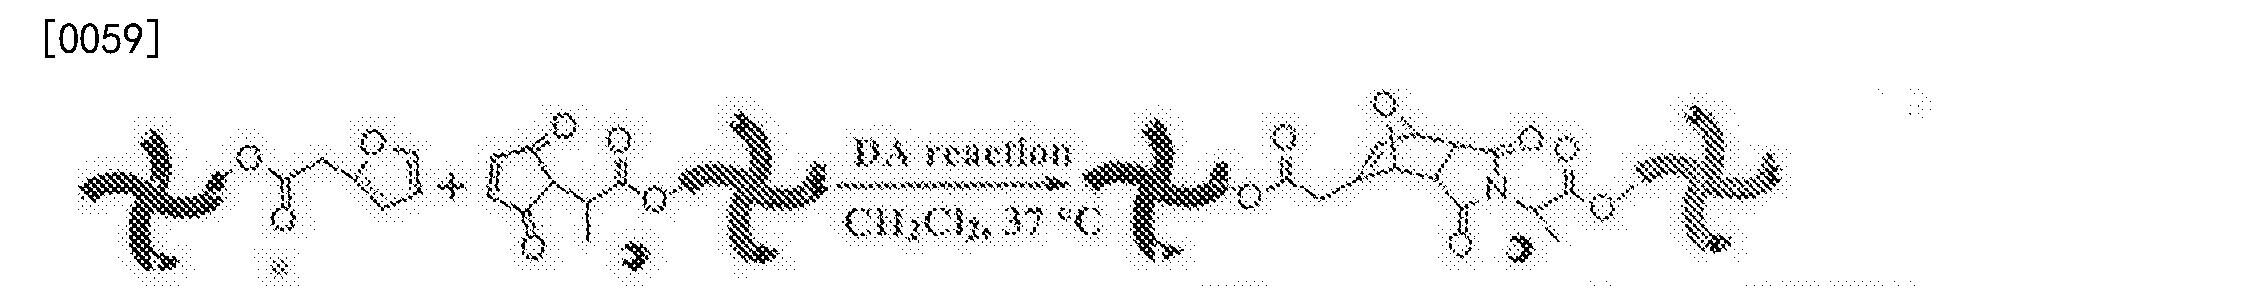 Figure CN105017538AD00062